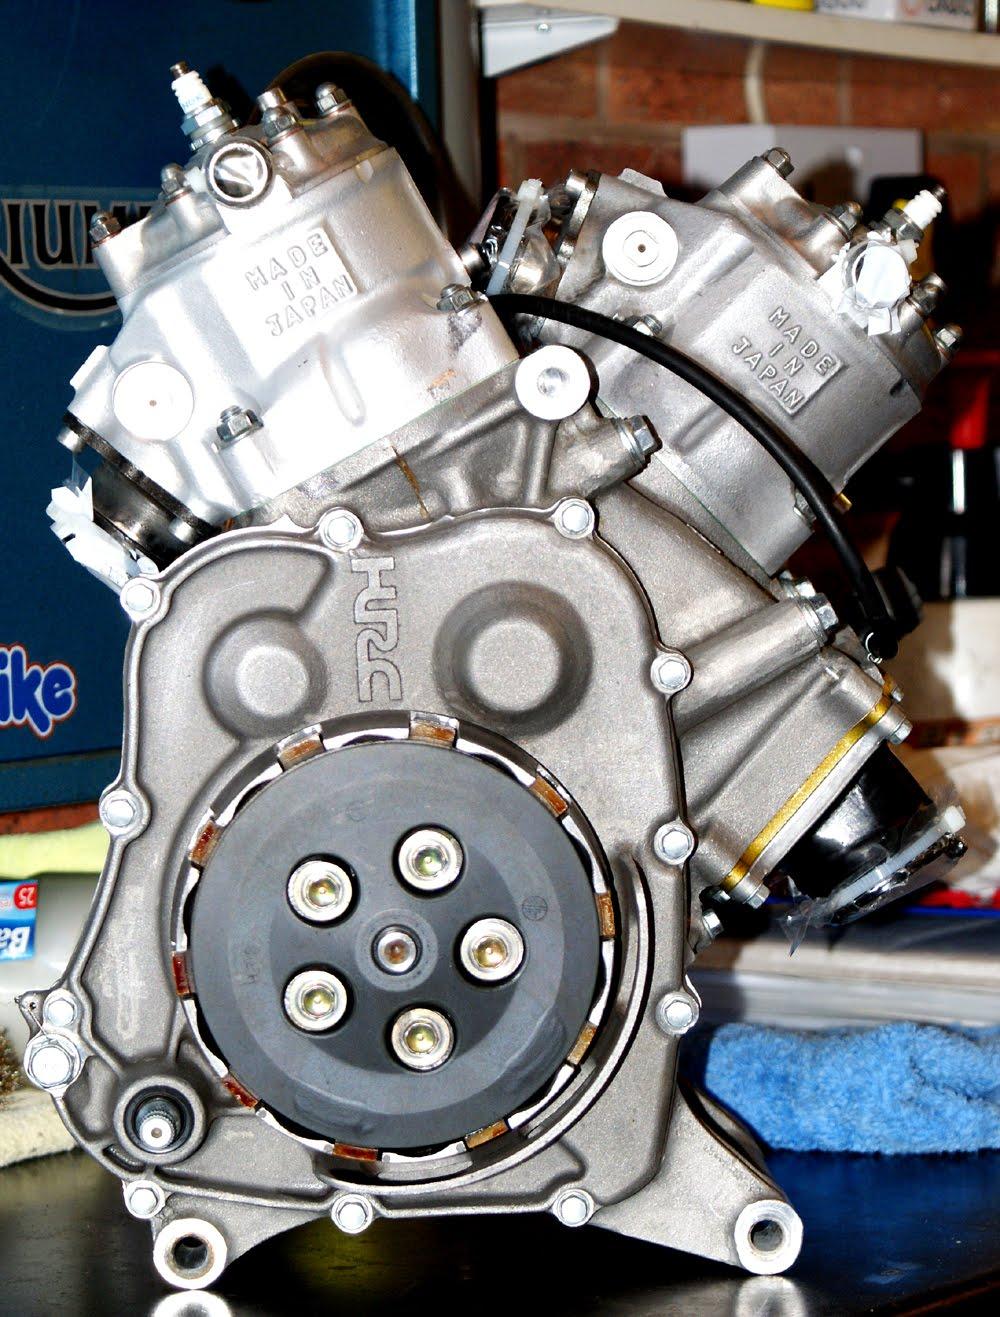 Eses Works Engine Tuner Archive Page 39 Kiwi Biker Forums Penta Marine Parts Further Ducati Diagram Besides 50cc